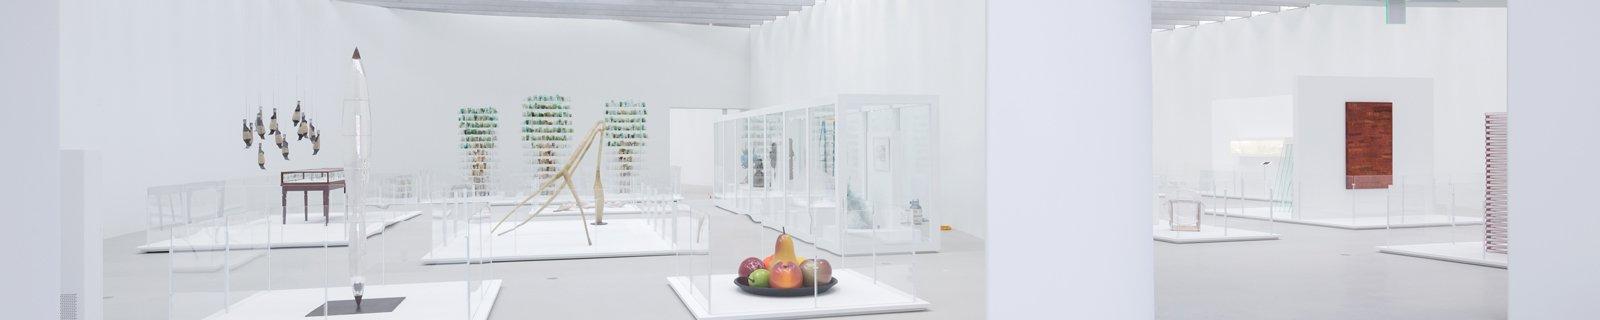 The Contemporary Art + Design galleries